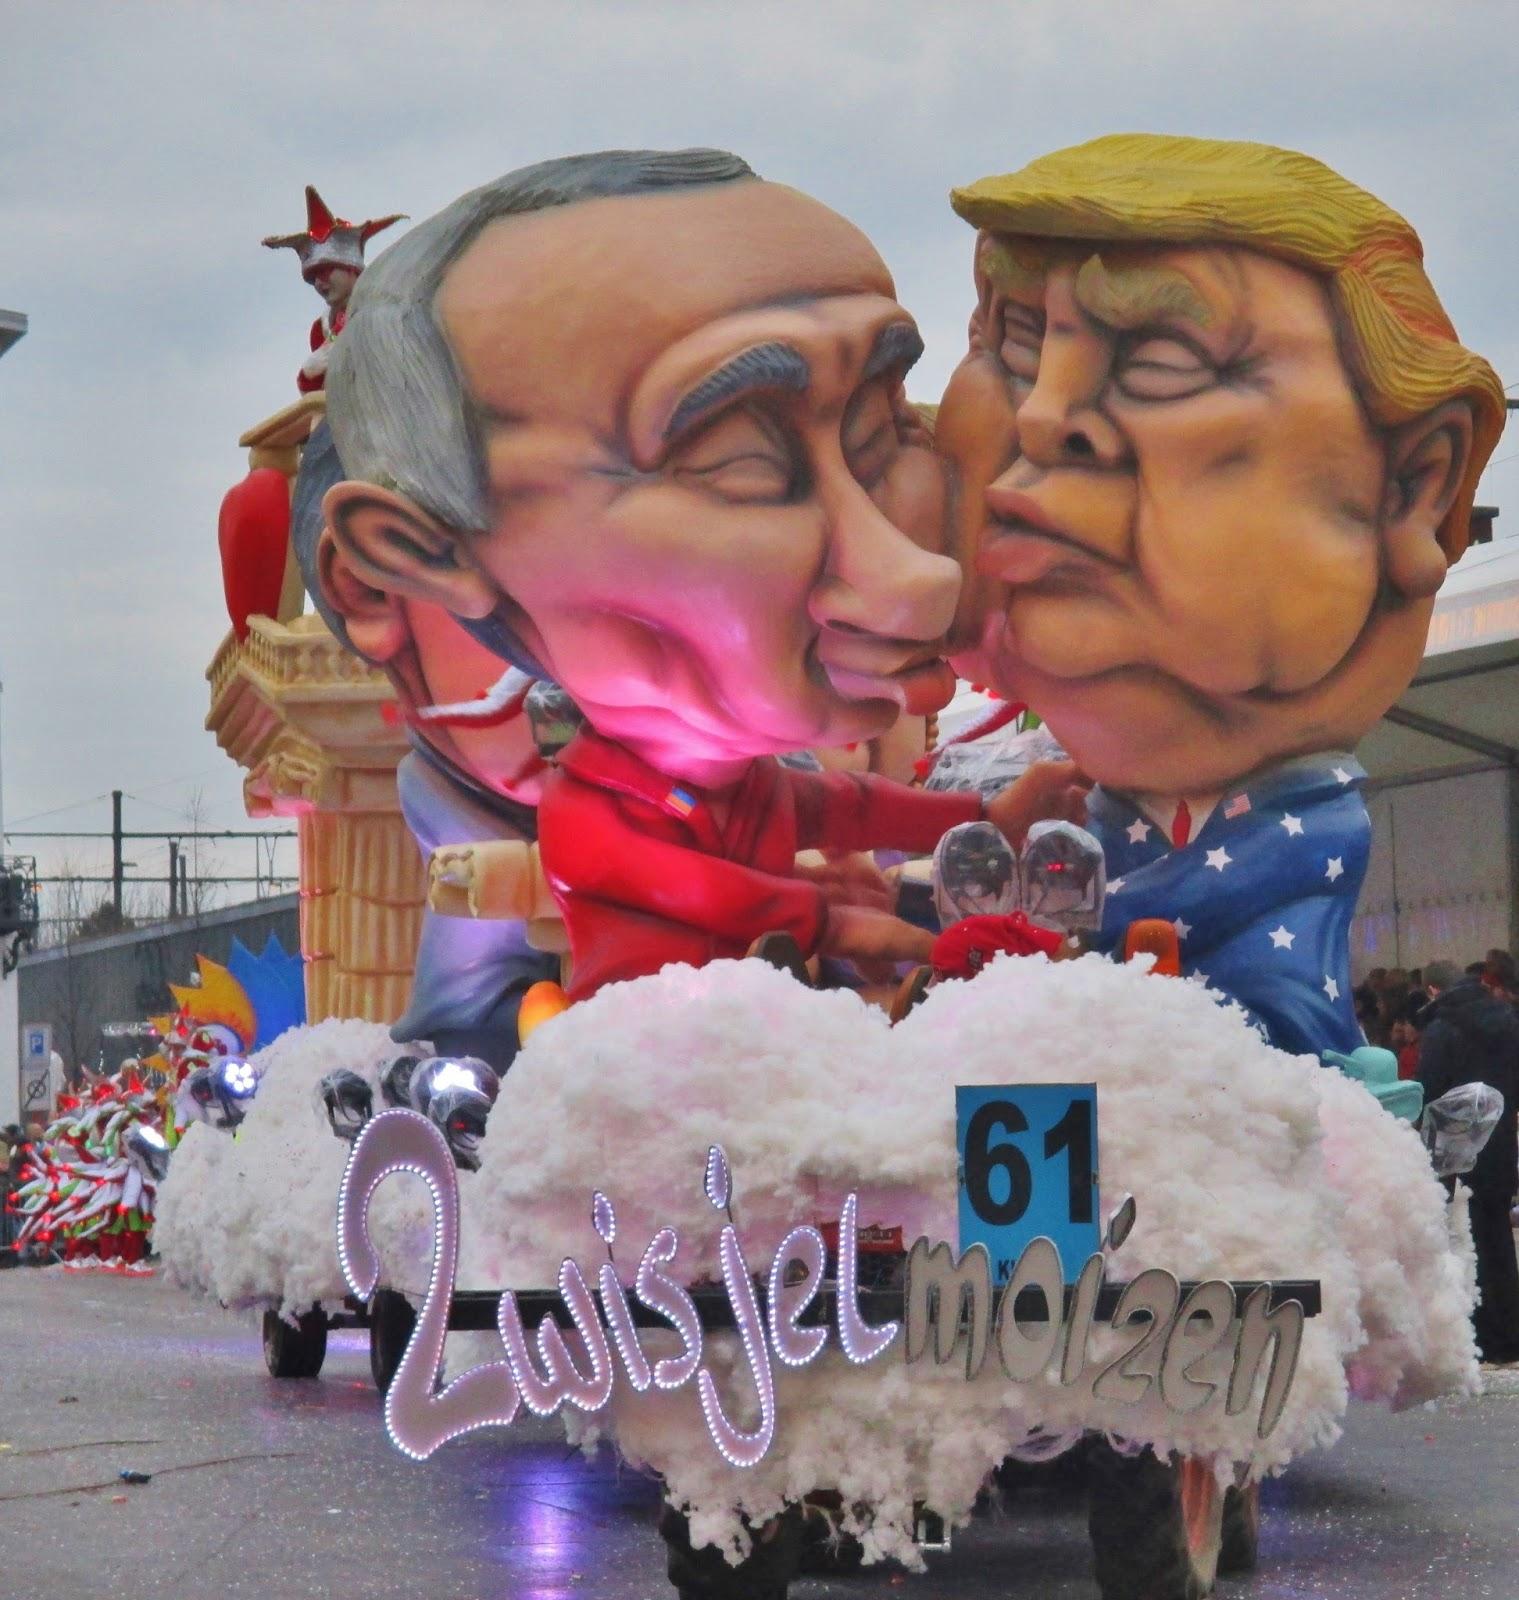 Carnaval Aalst foto- en videoblog: Aalst Carnaval